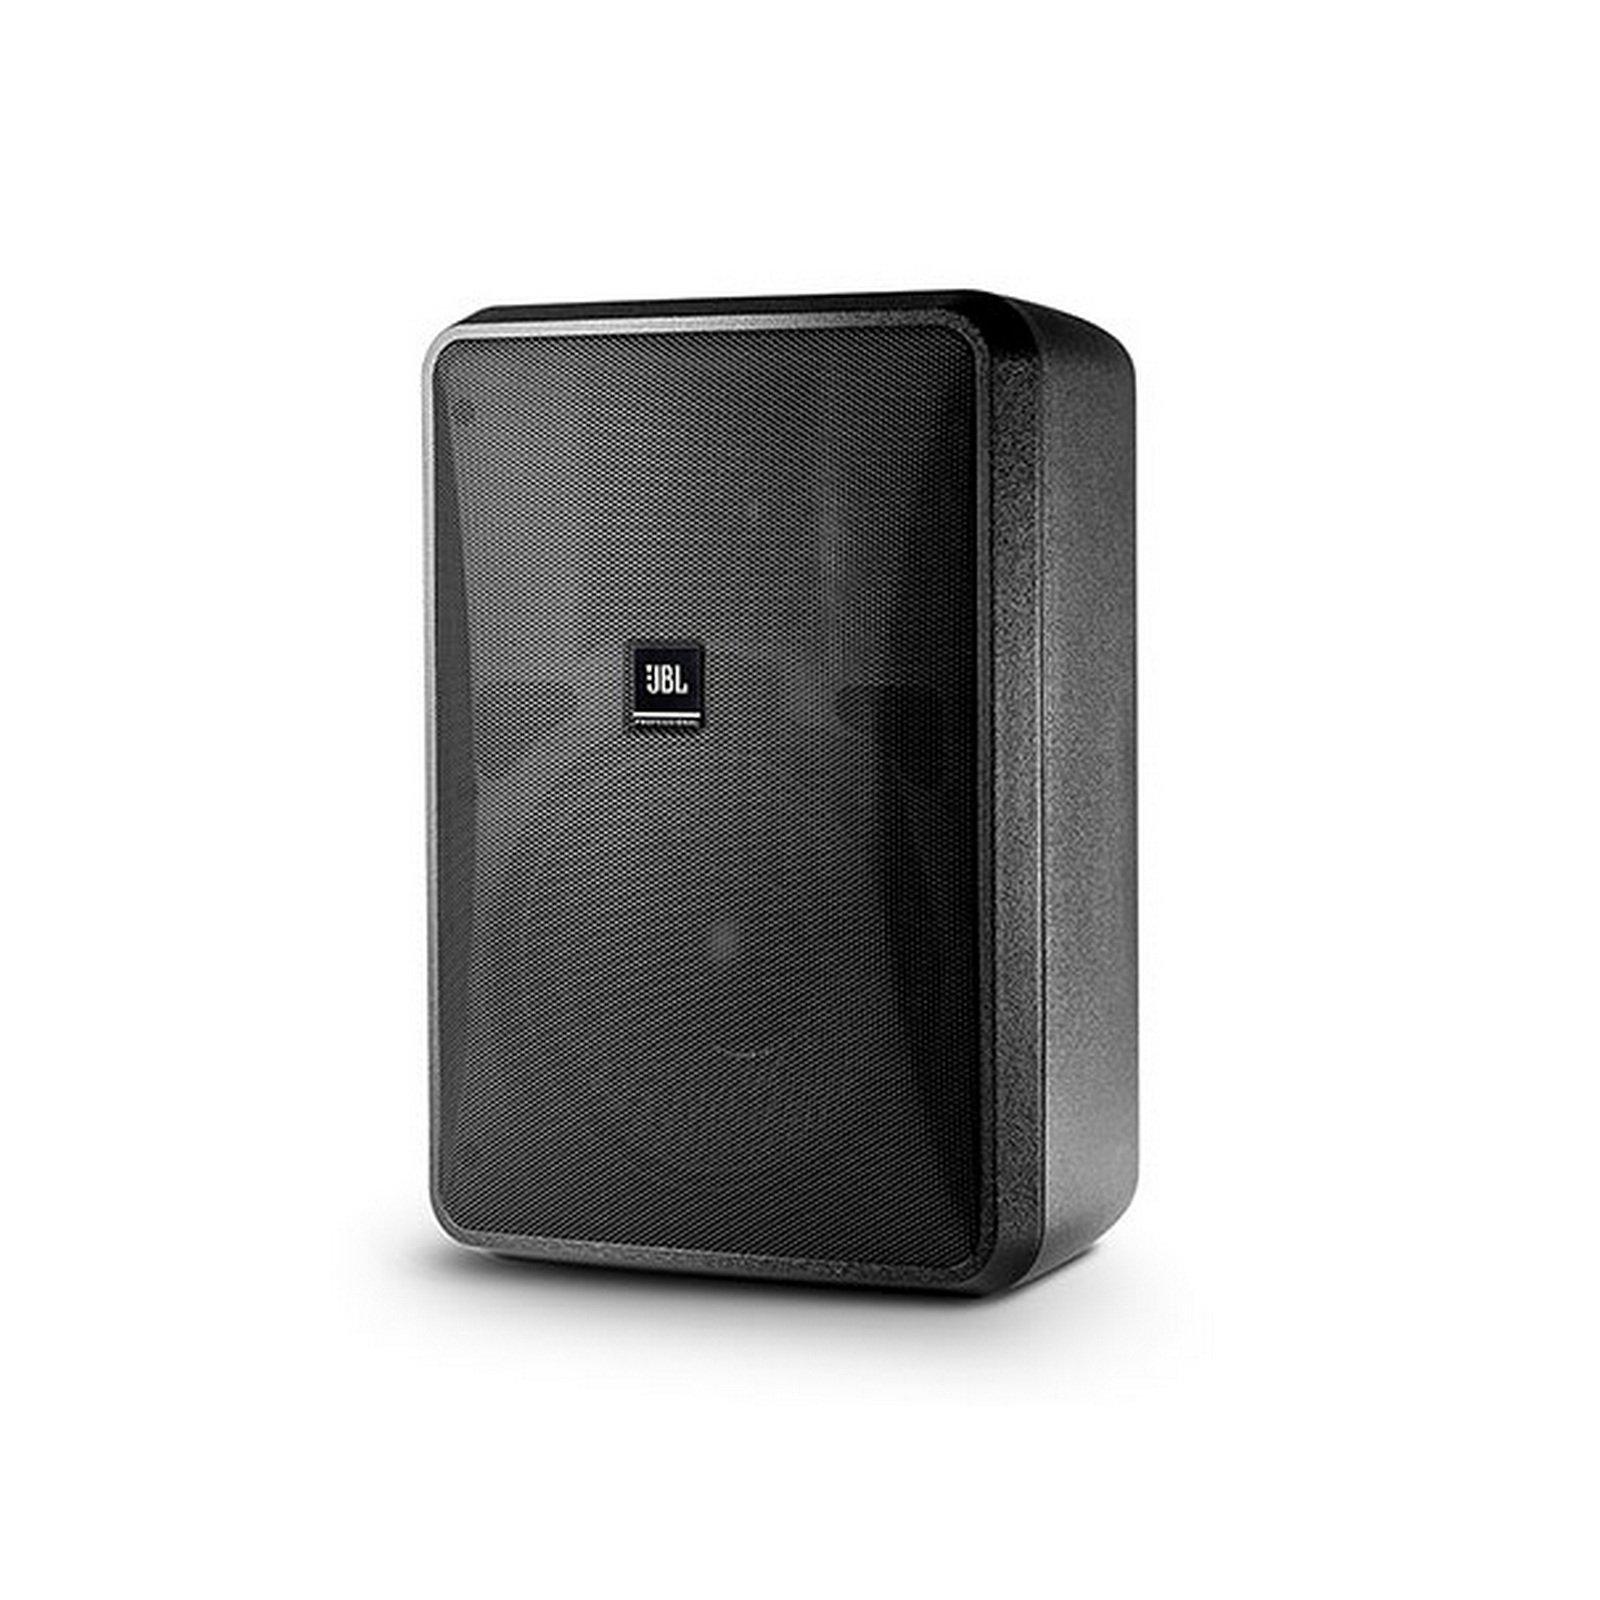 JBL CONTROL 28-1L | Low Impedance 8 Ohm Background Speaker Black Pair